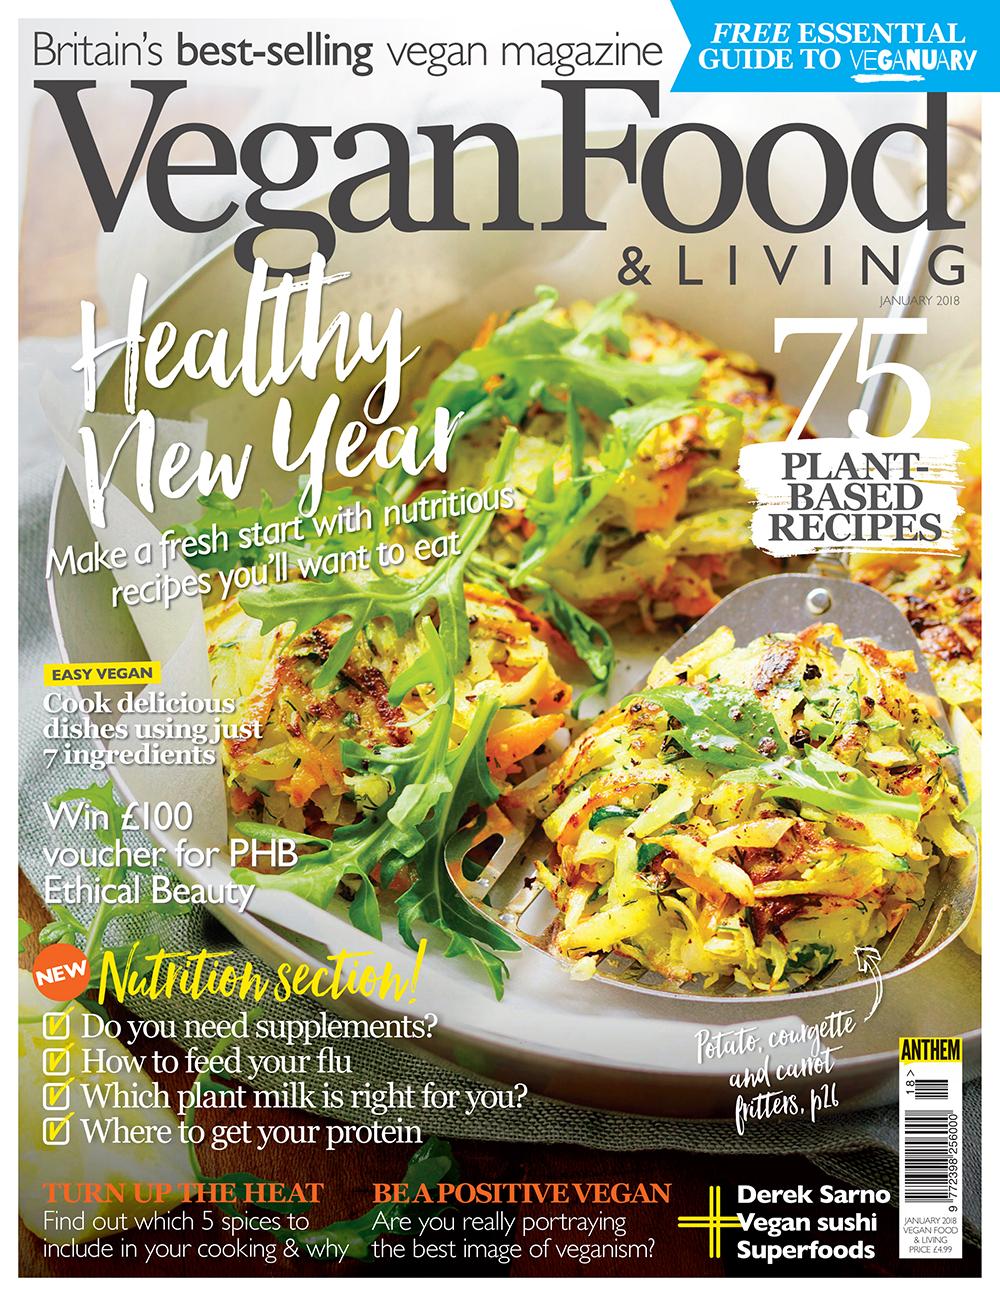 Vegan Food & Living January 2018